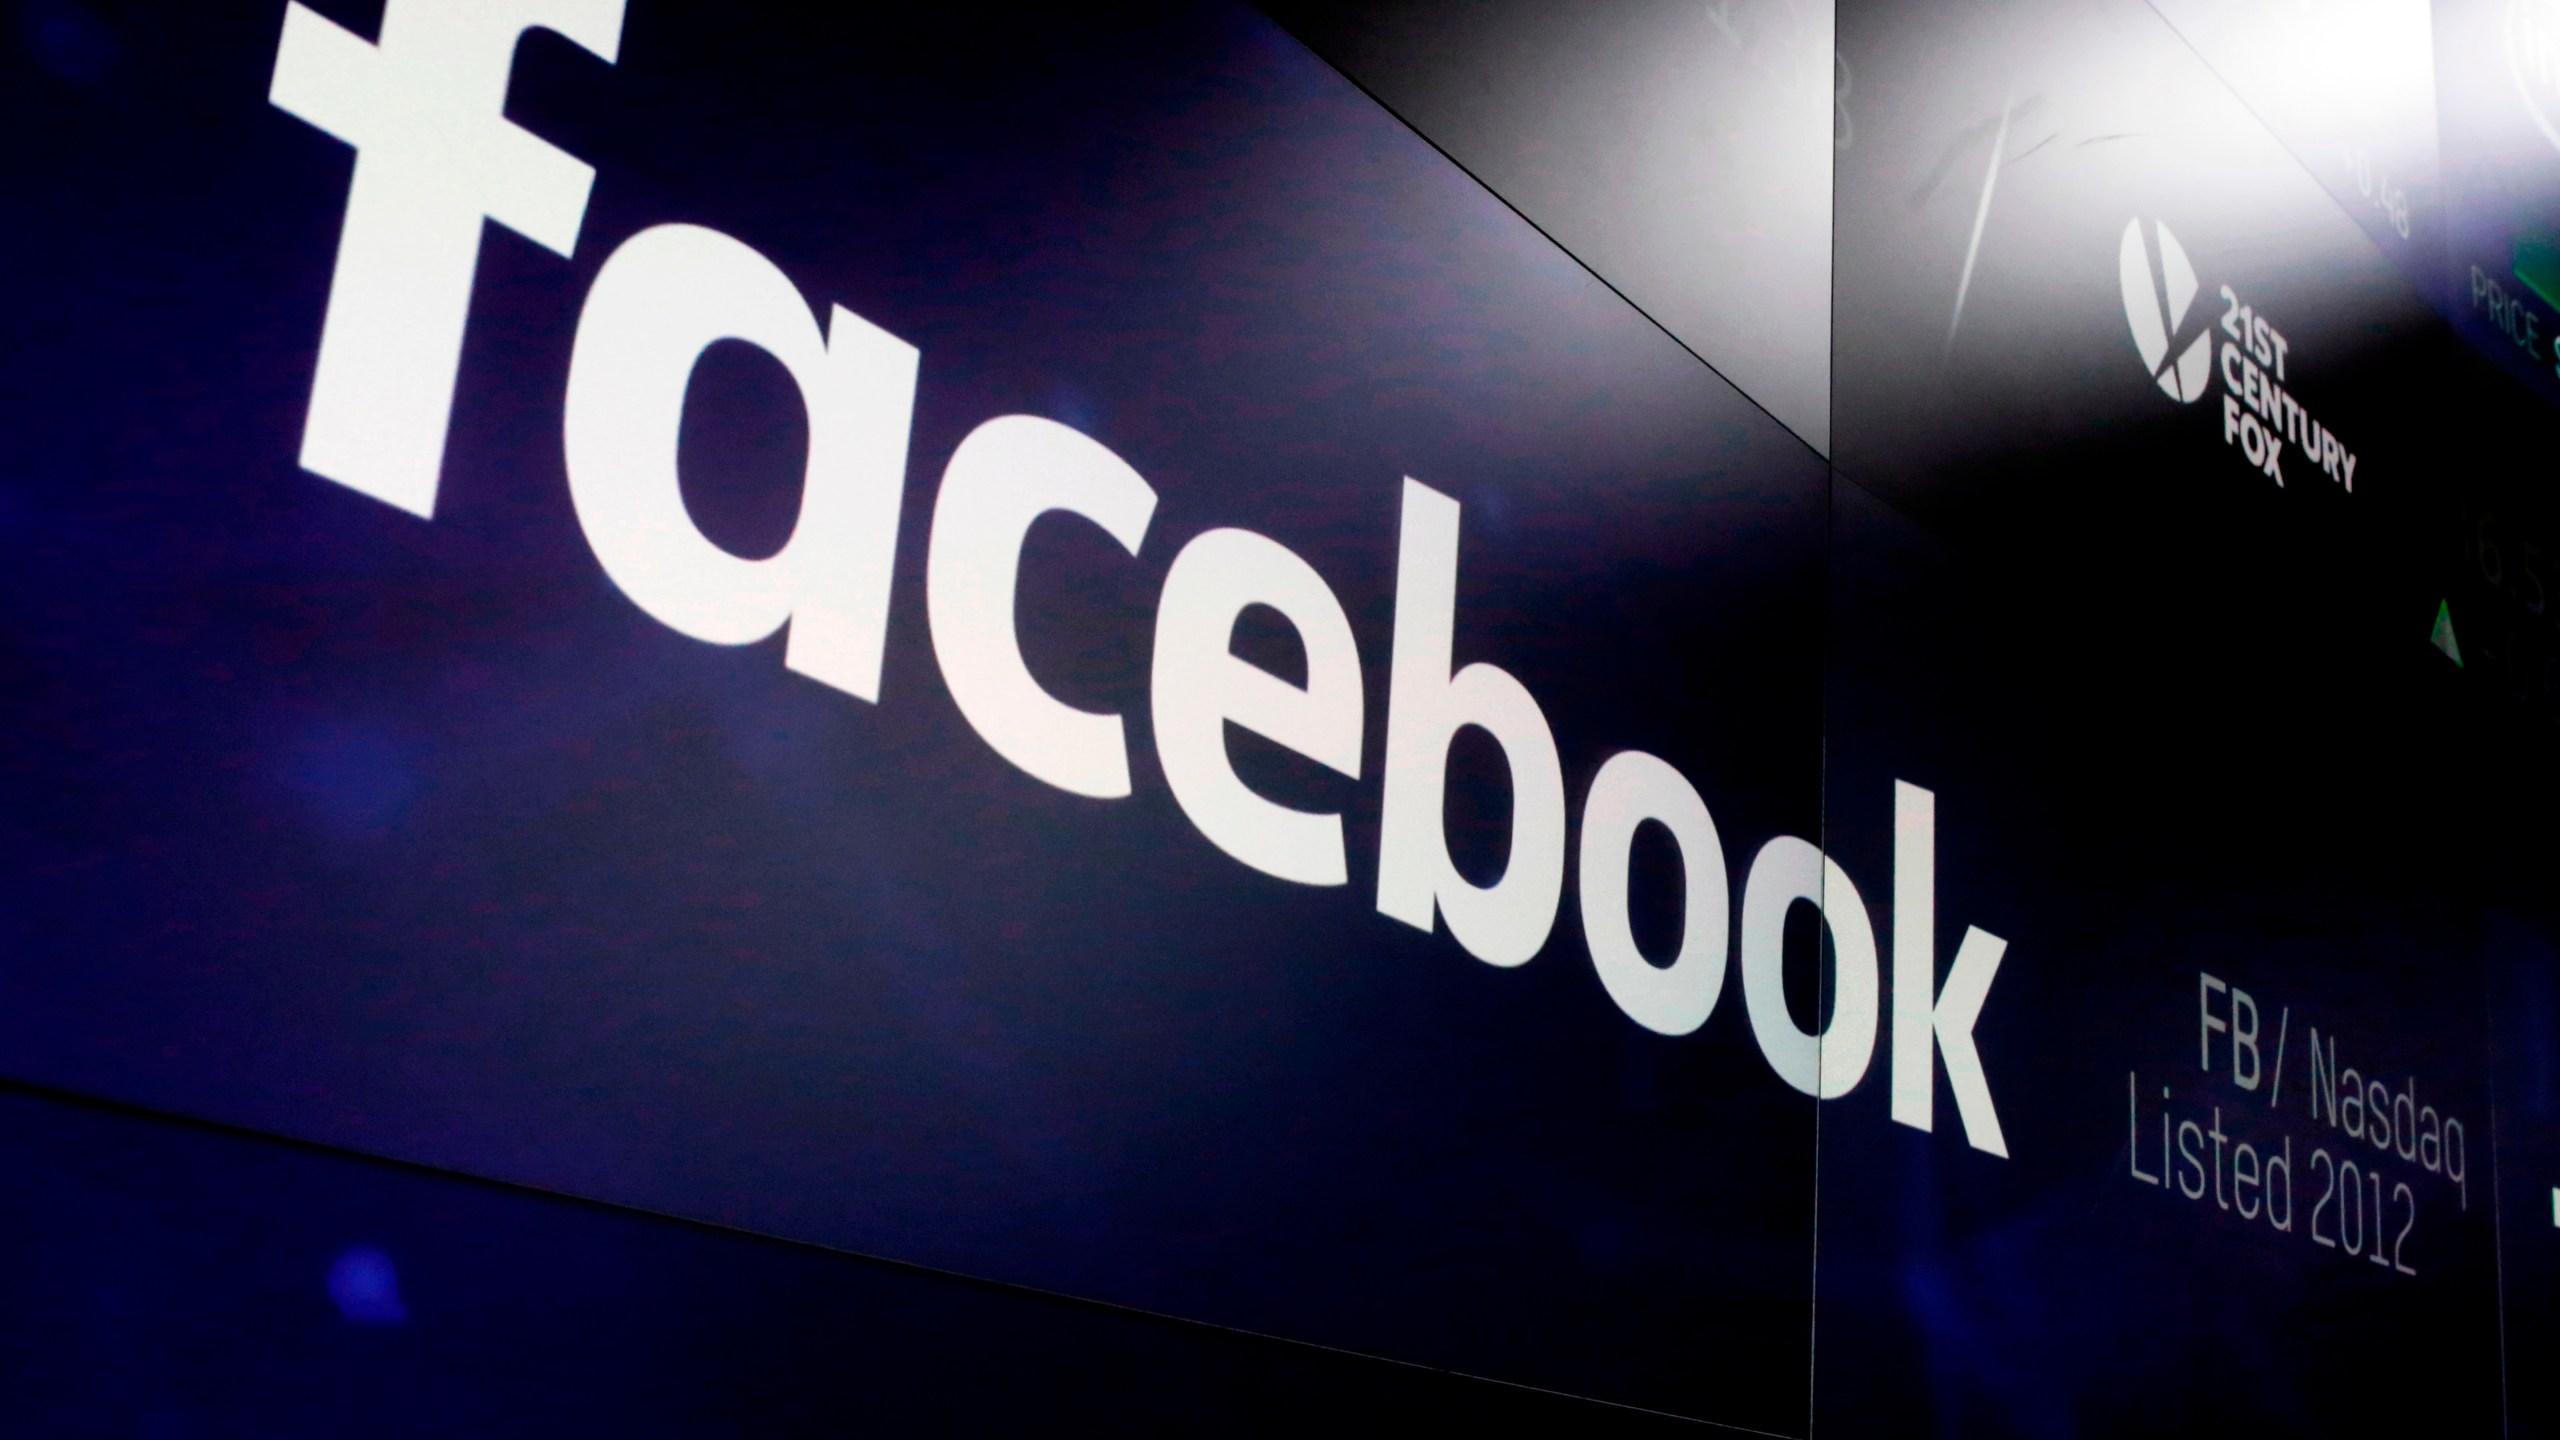 Facebook_Privacy_Scandal_User_Notice_54499-159532.jpg56813338